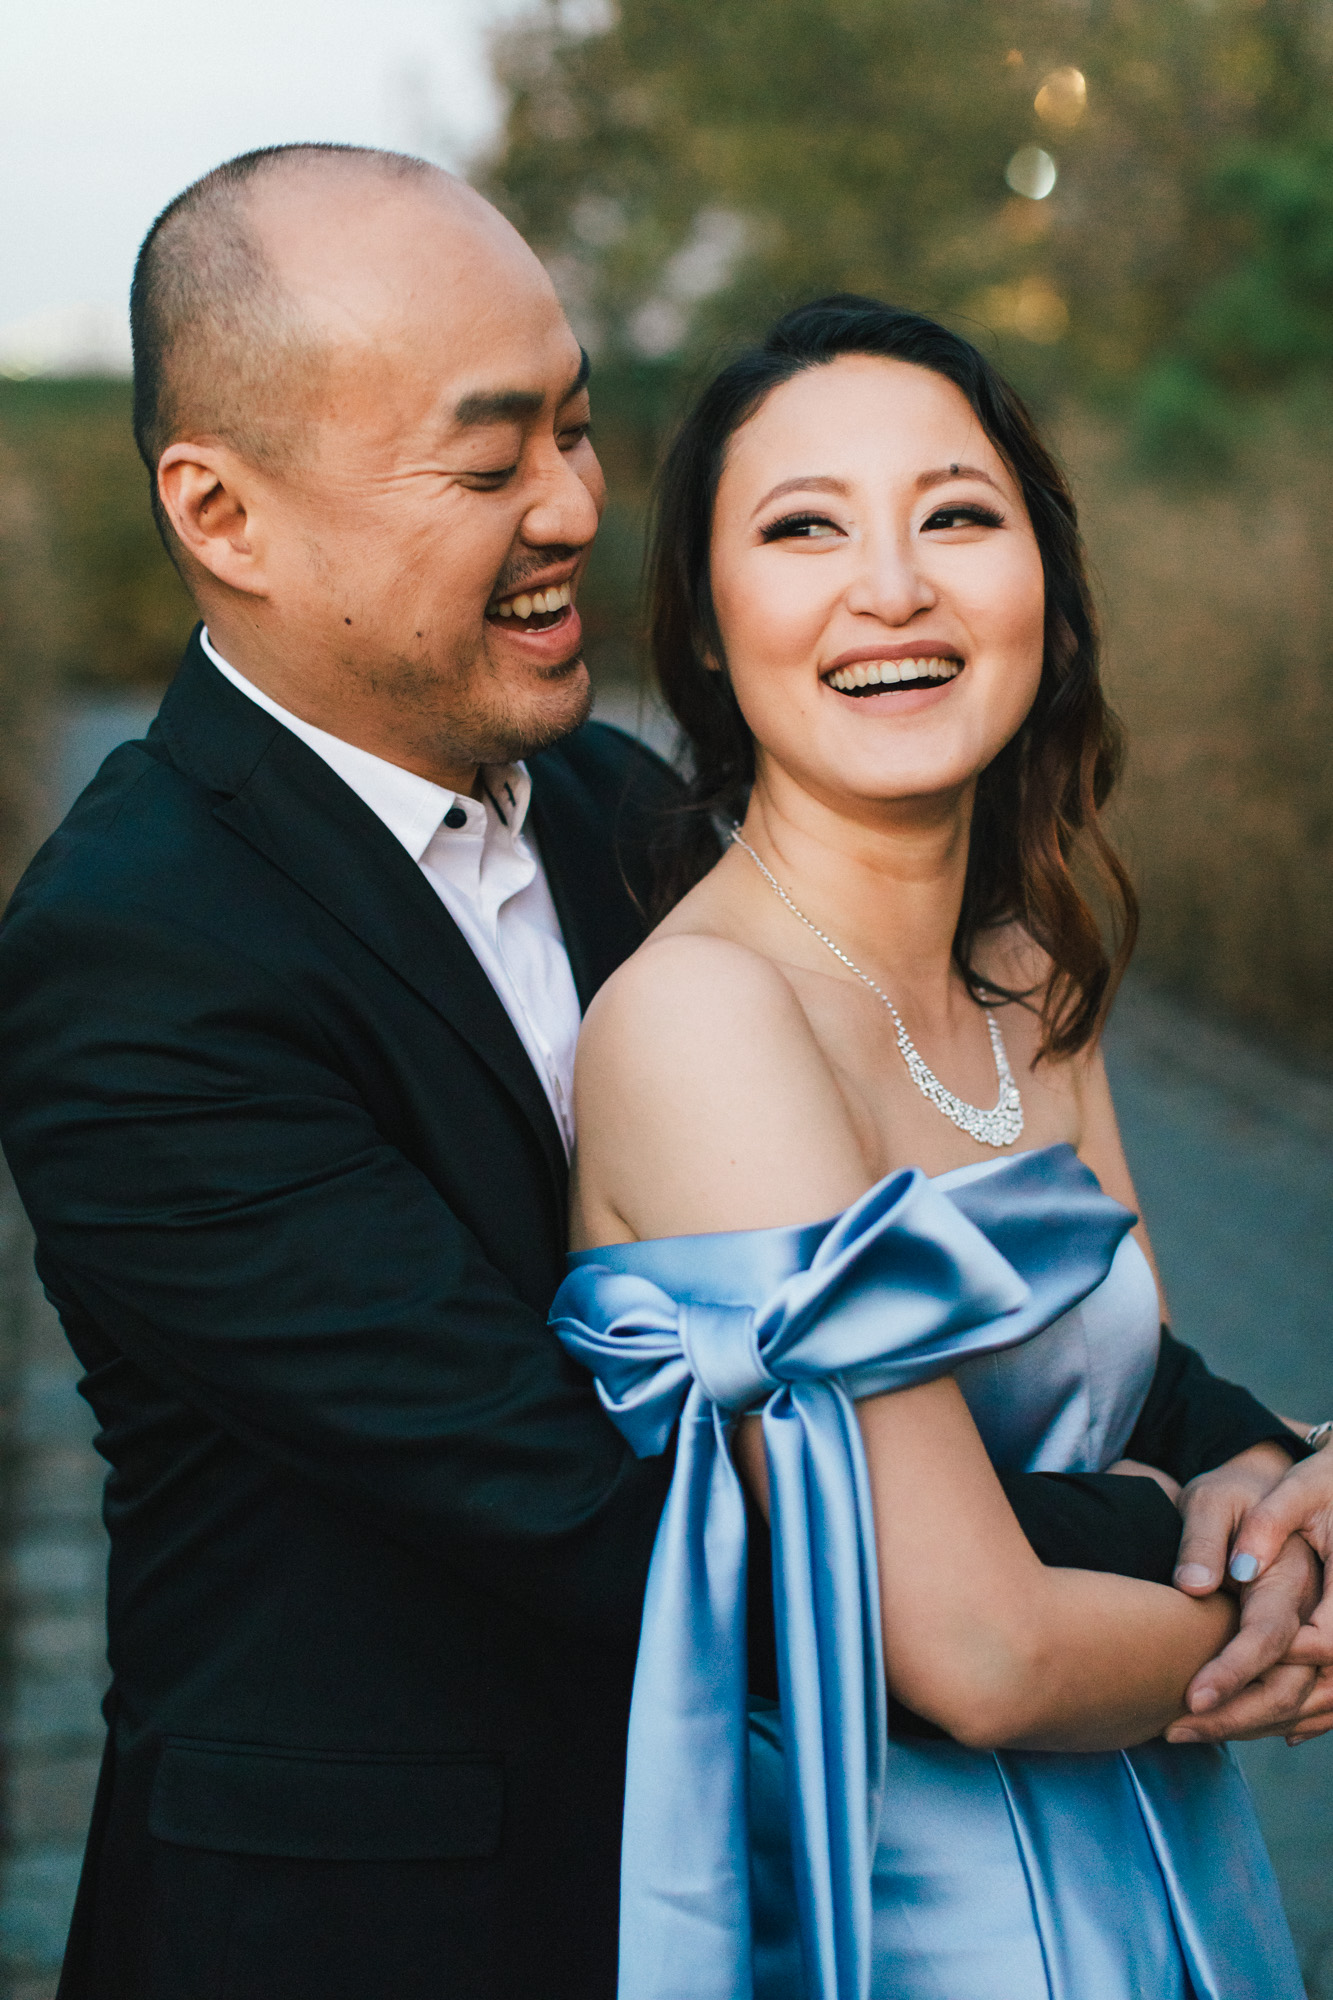 Brooklyn NYC Wedding Photographer Boris Zaretsky DUMBO engagement photography 5X2A8025 copy.jpg